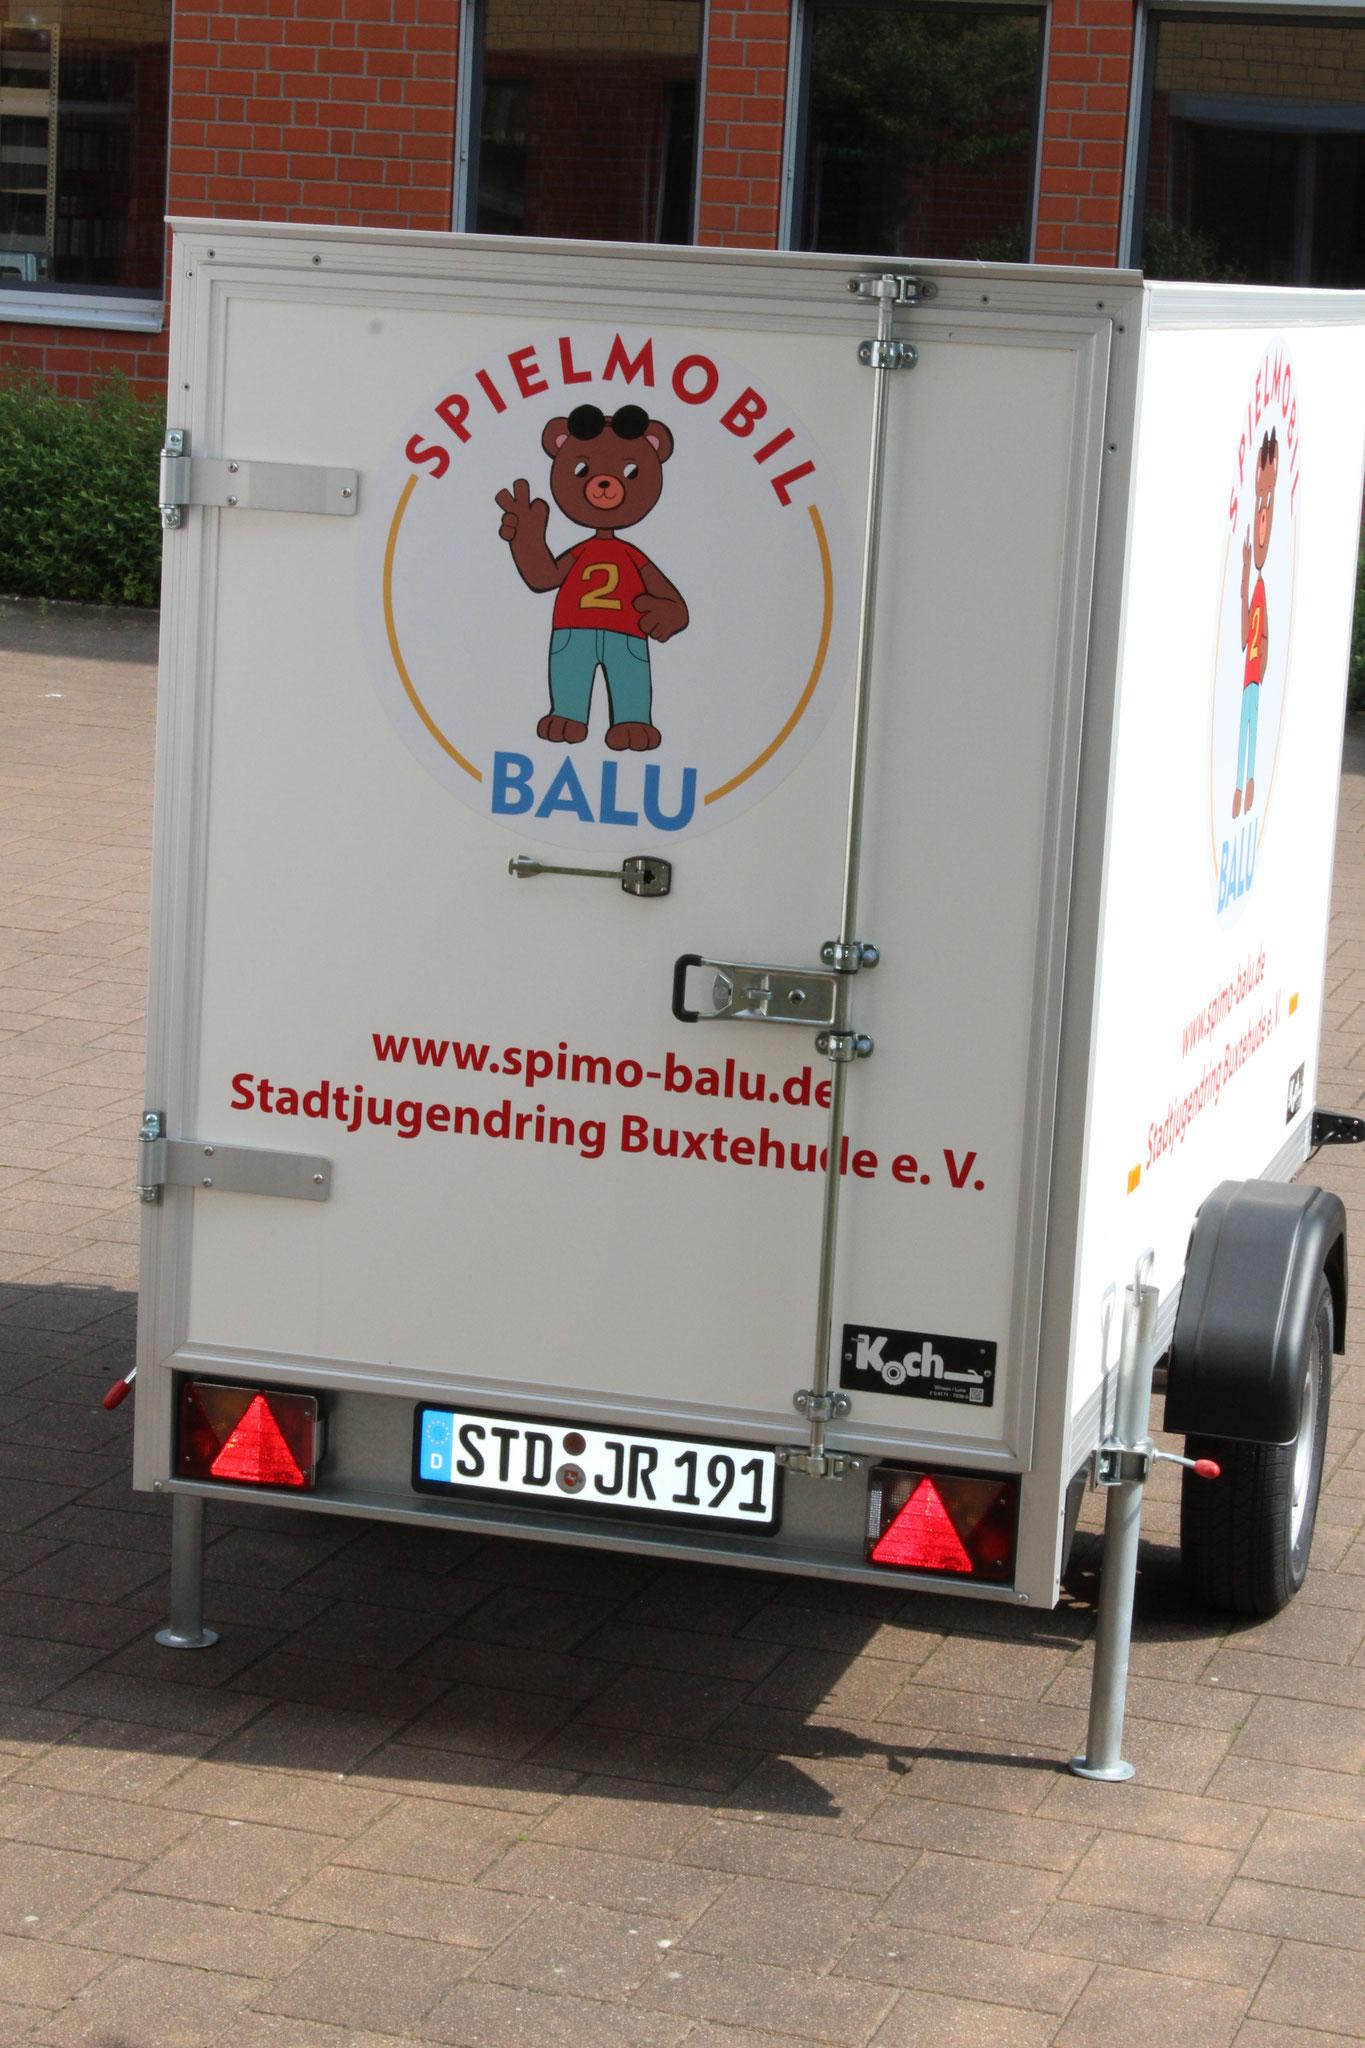 BALU 2.0 - Allzeit gute Fahrt!